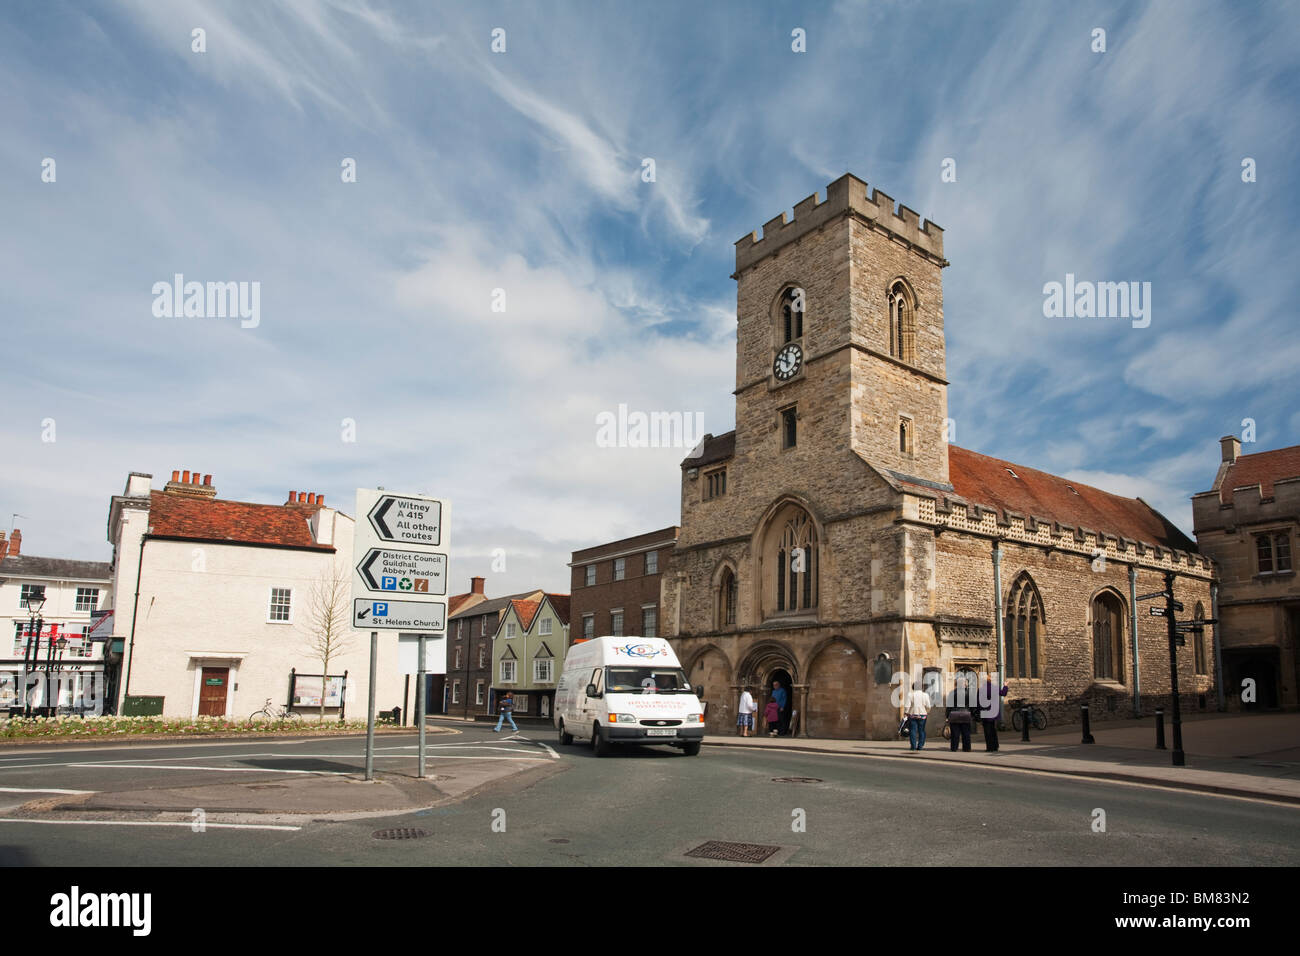 St Nicholas' Church in Abingdon town centre, Oxfordshire, Uk - Stock Image